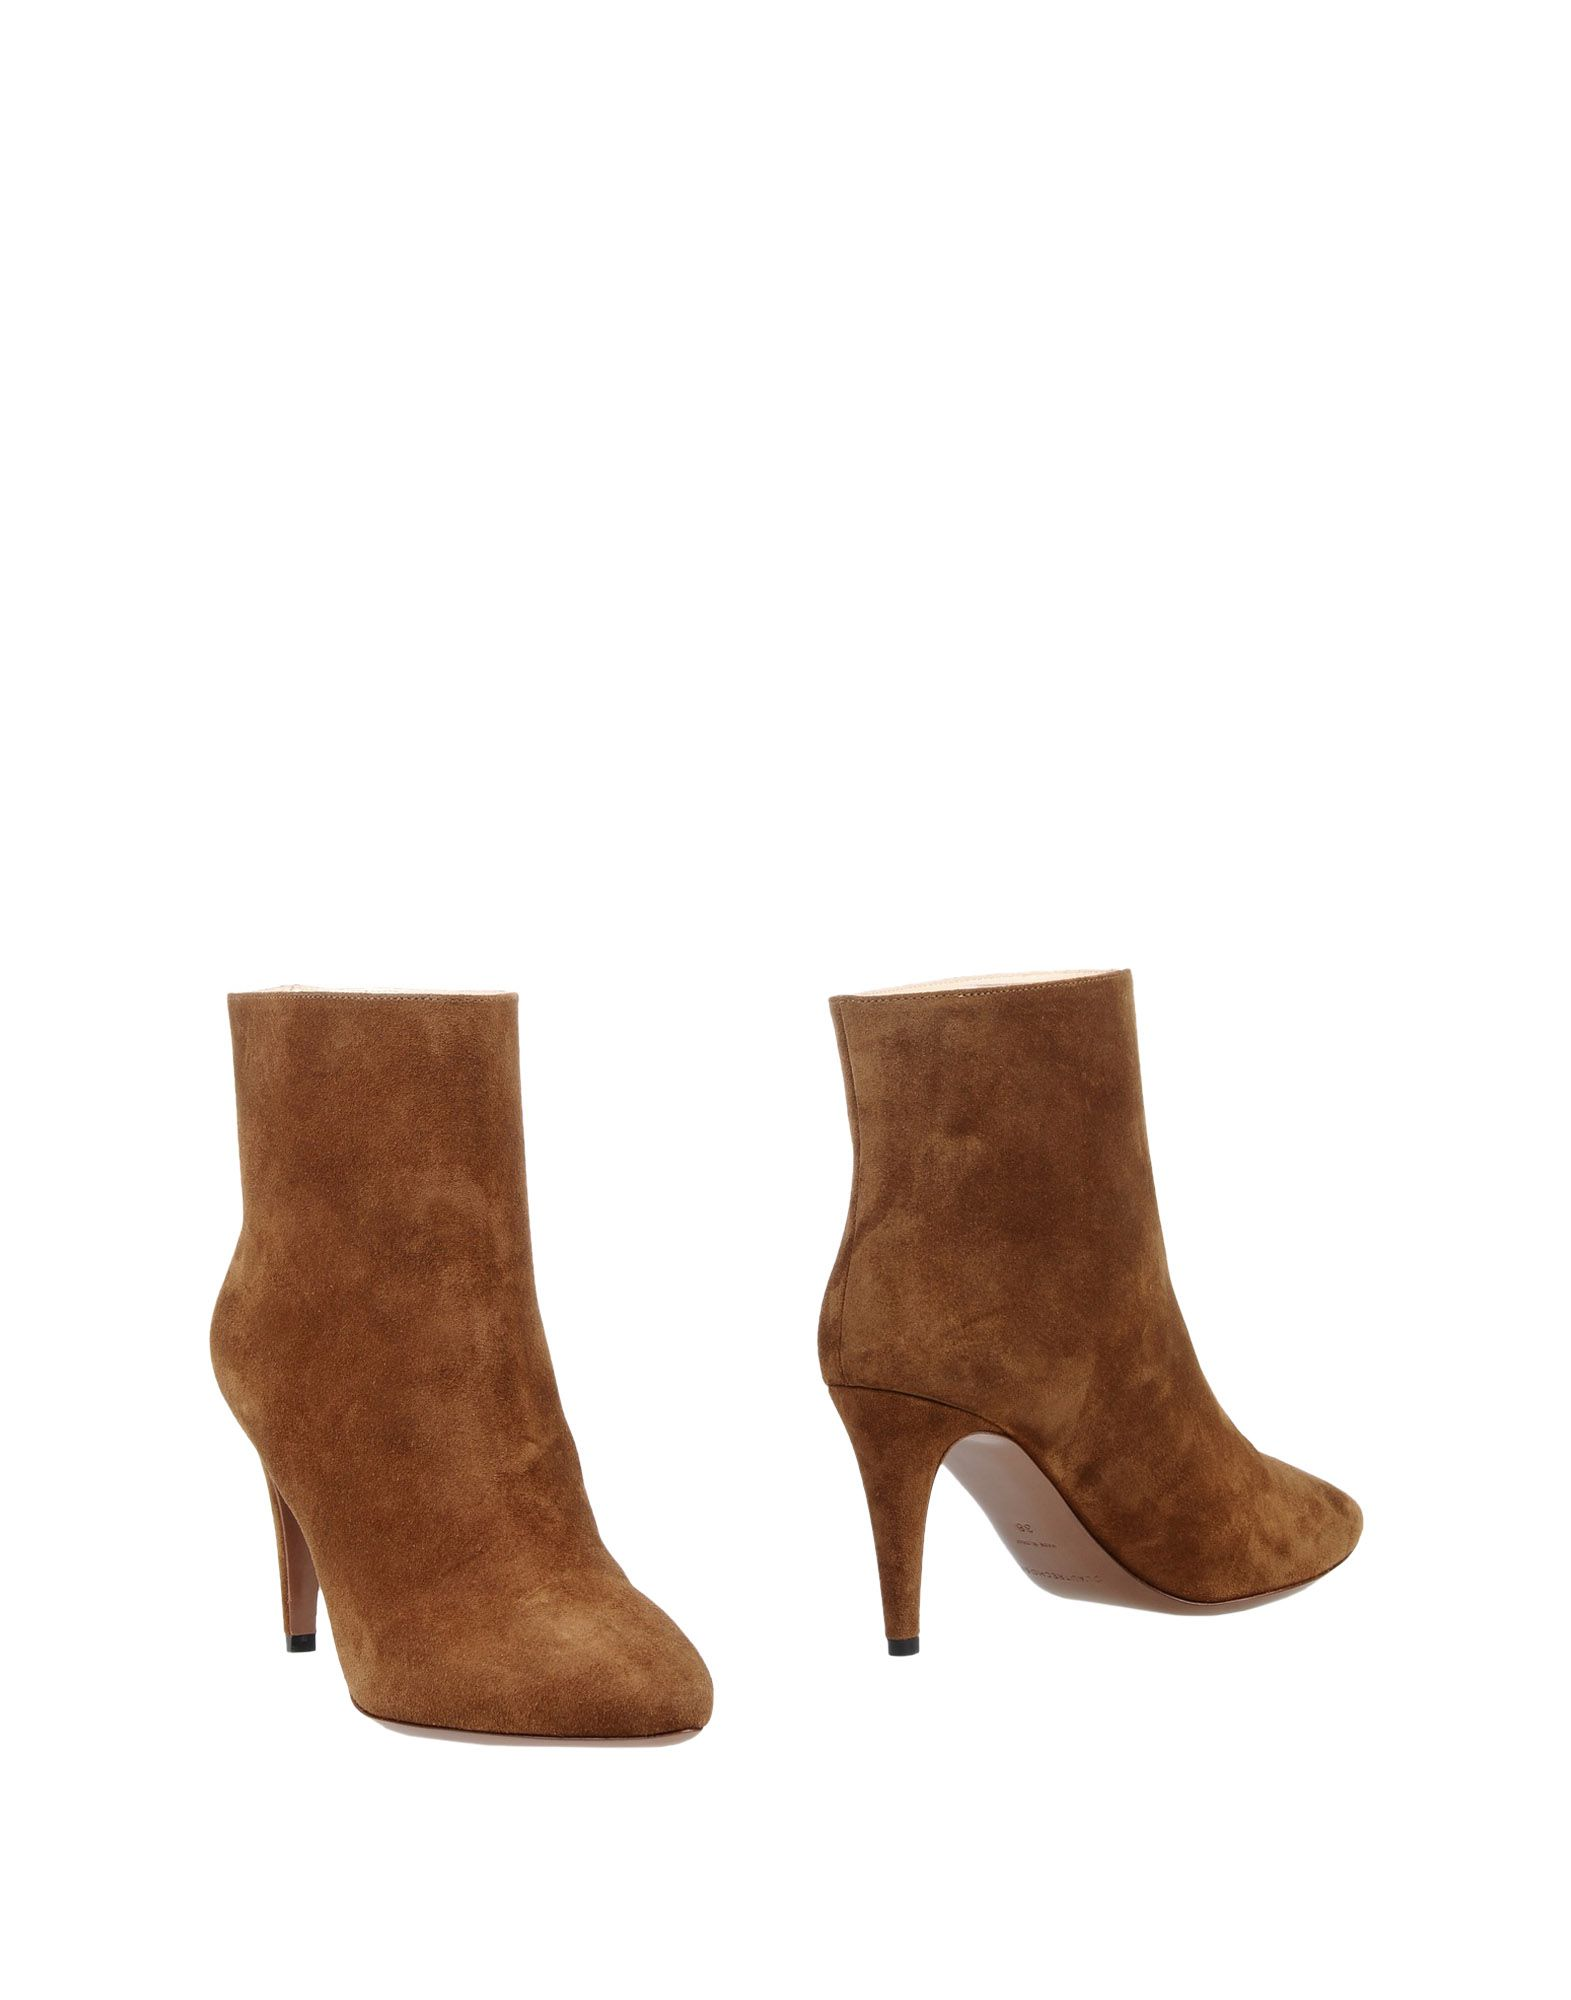 L' Autre Damen Chose Stiefelette Damen Autre  11380885TF Neue Schuhe f49051